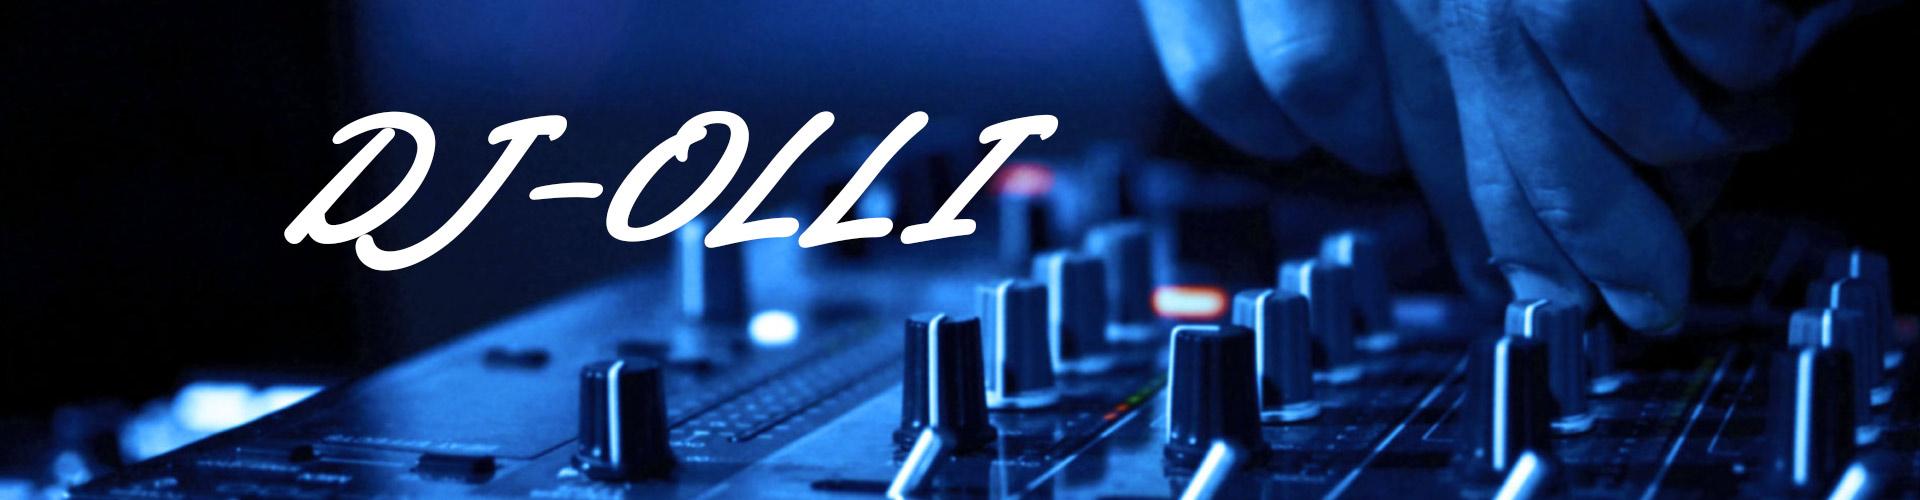 DJ-OLLI-HEADER-2